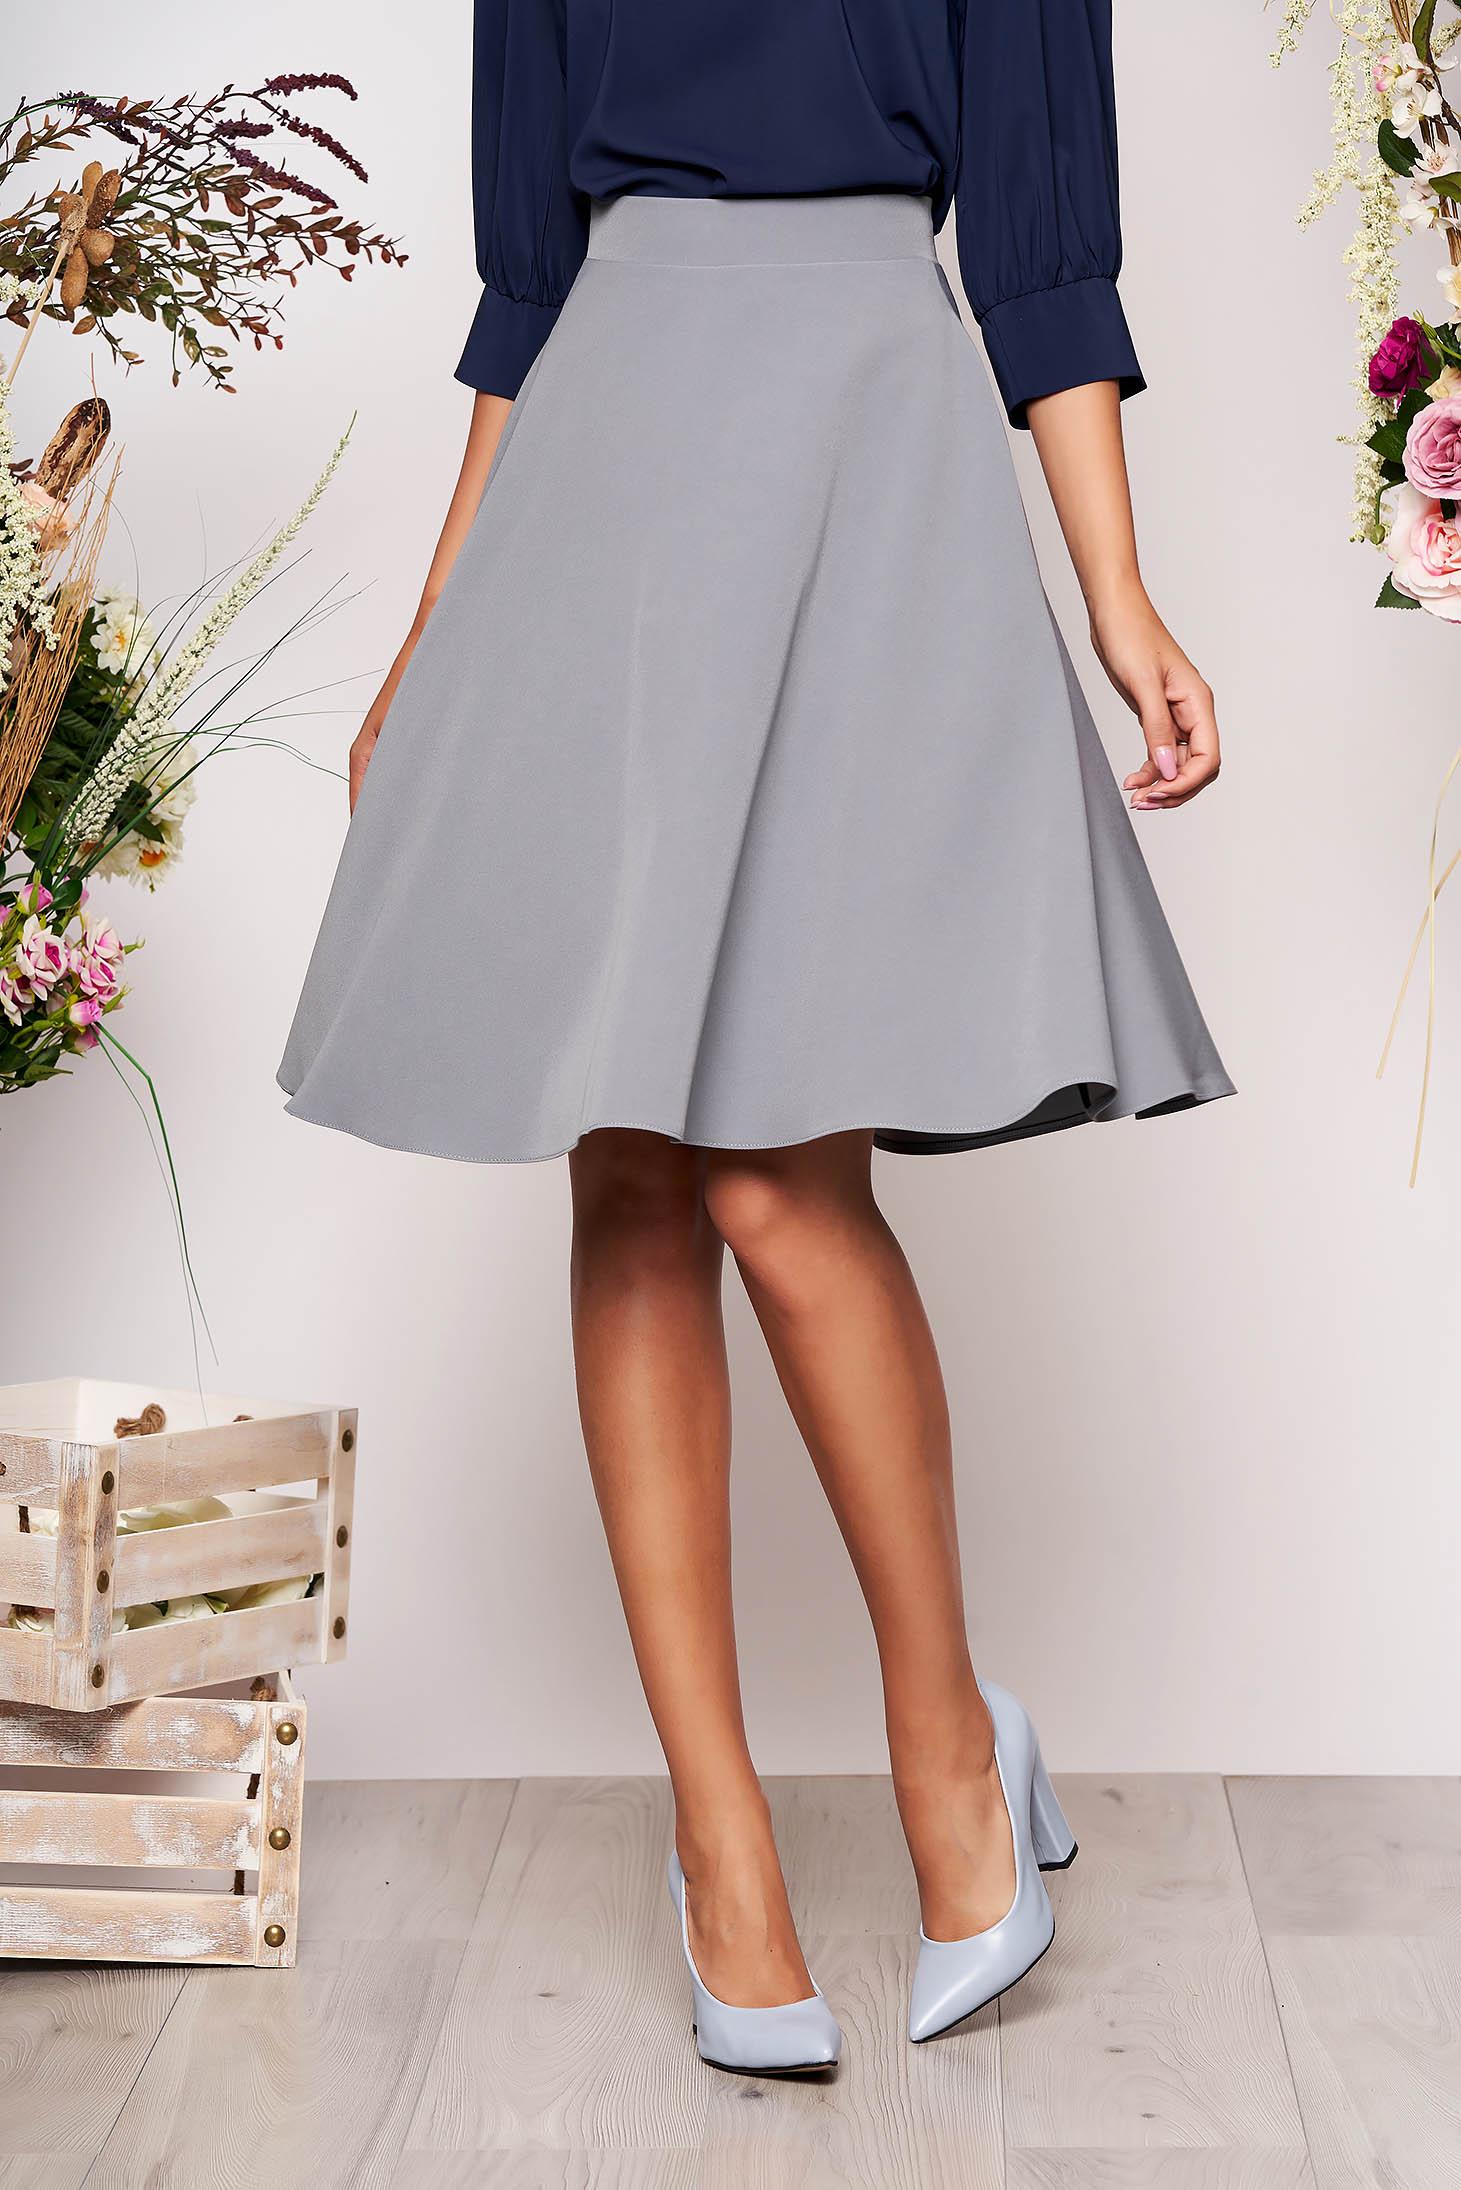 StarShinerS grey elegant cloche skirt high waisted slightly elastic fabric office